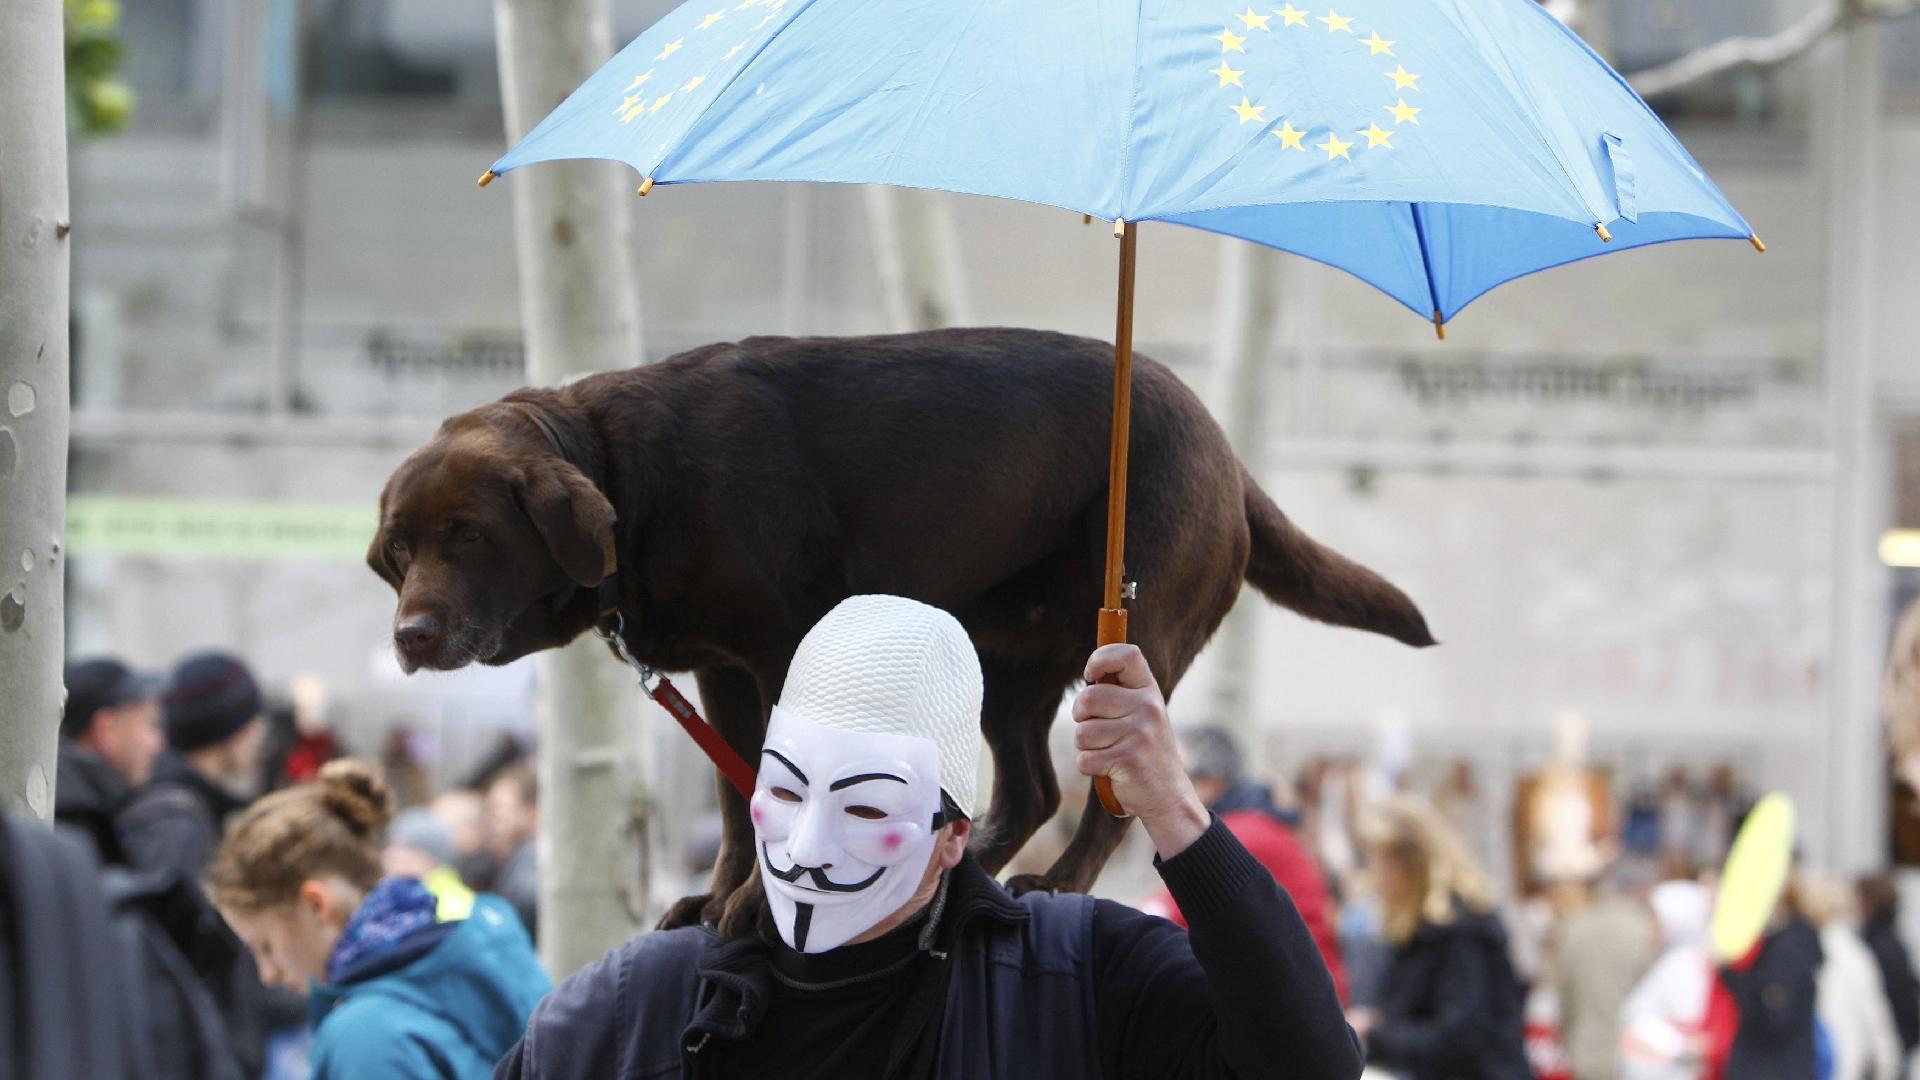 Ralph Orlowski/Reuters